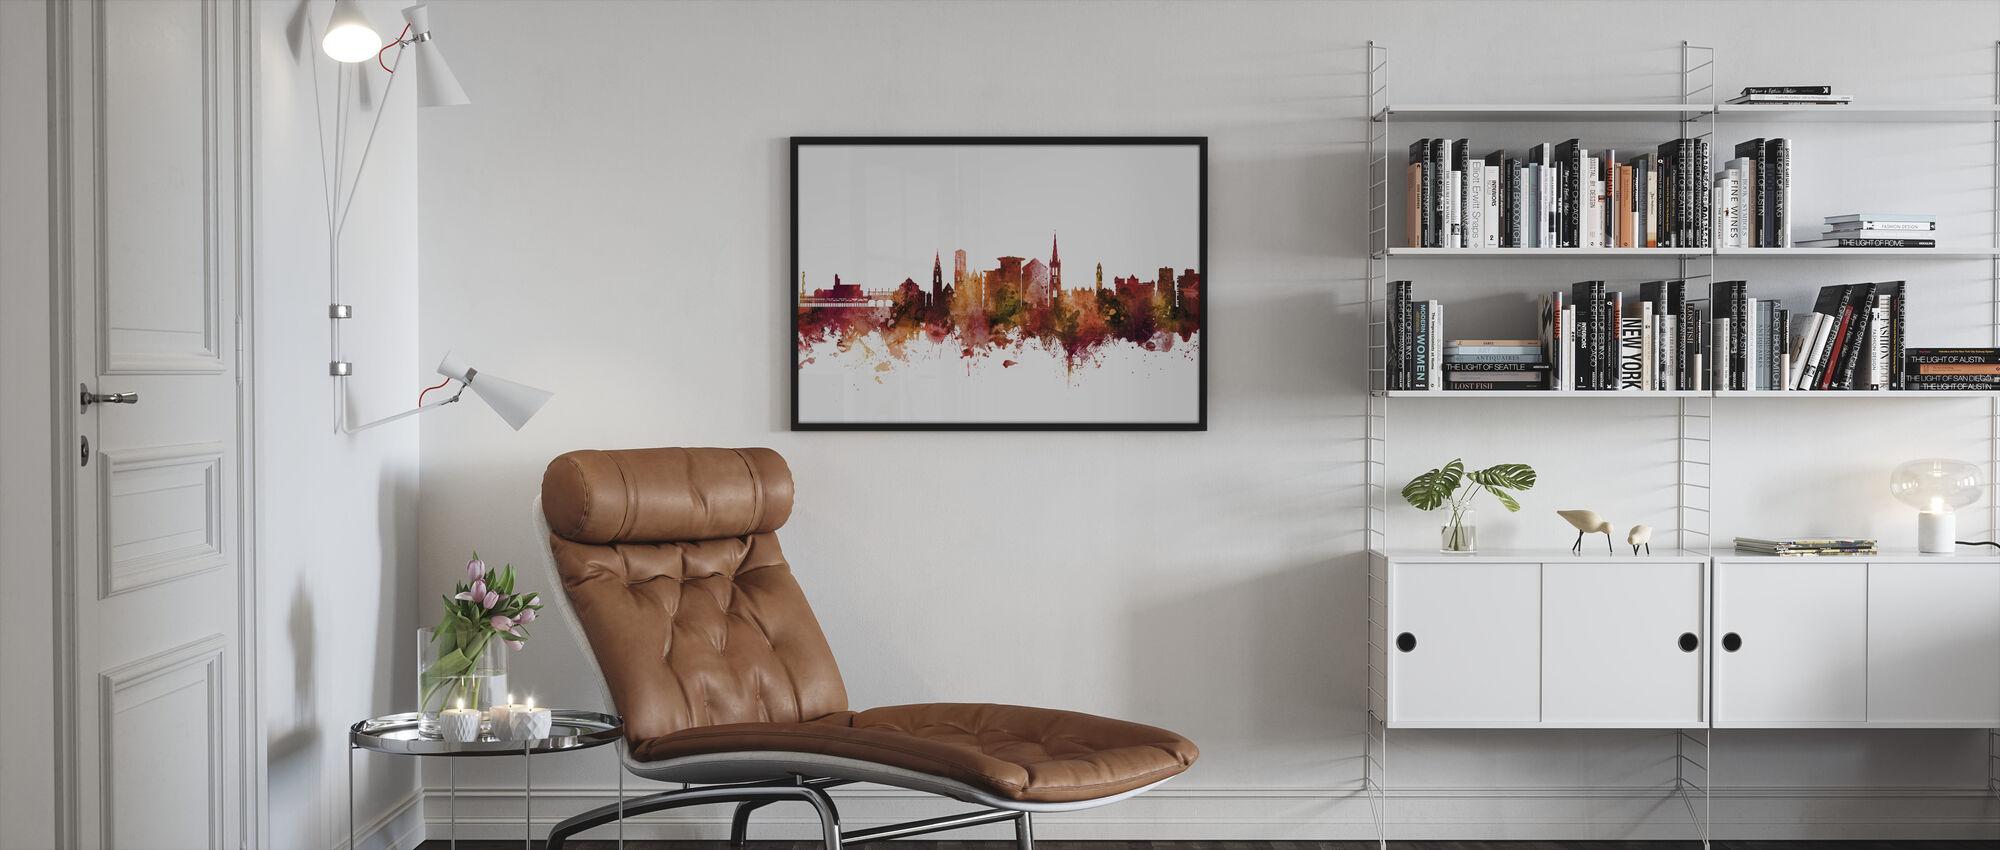 Bournemouth England Skyline - Framed print - Living Room